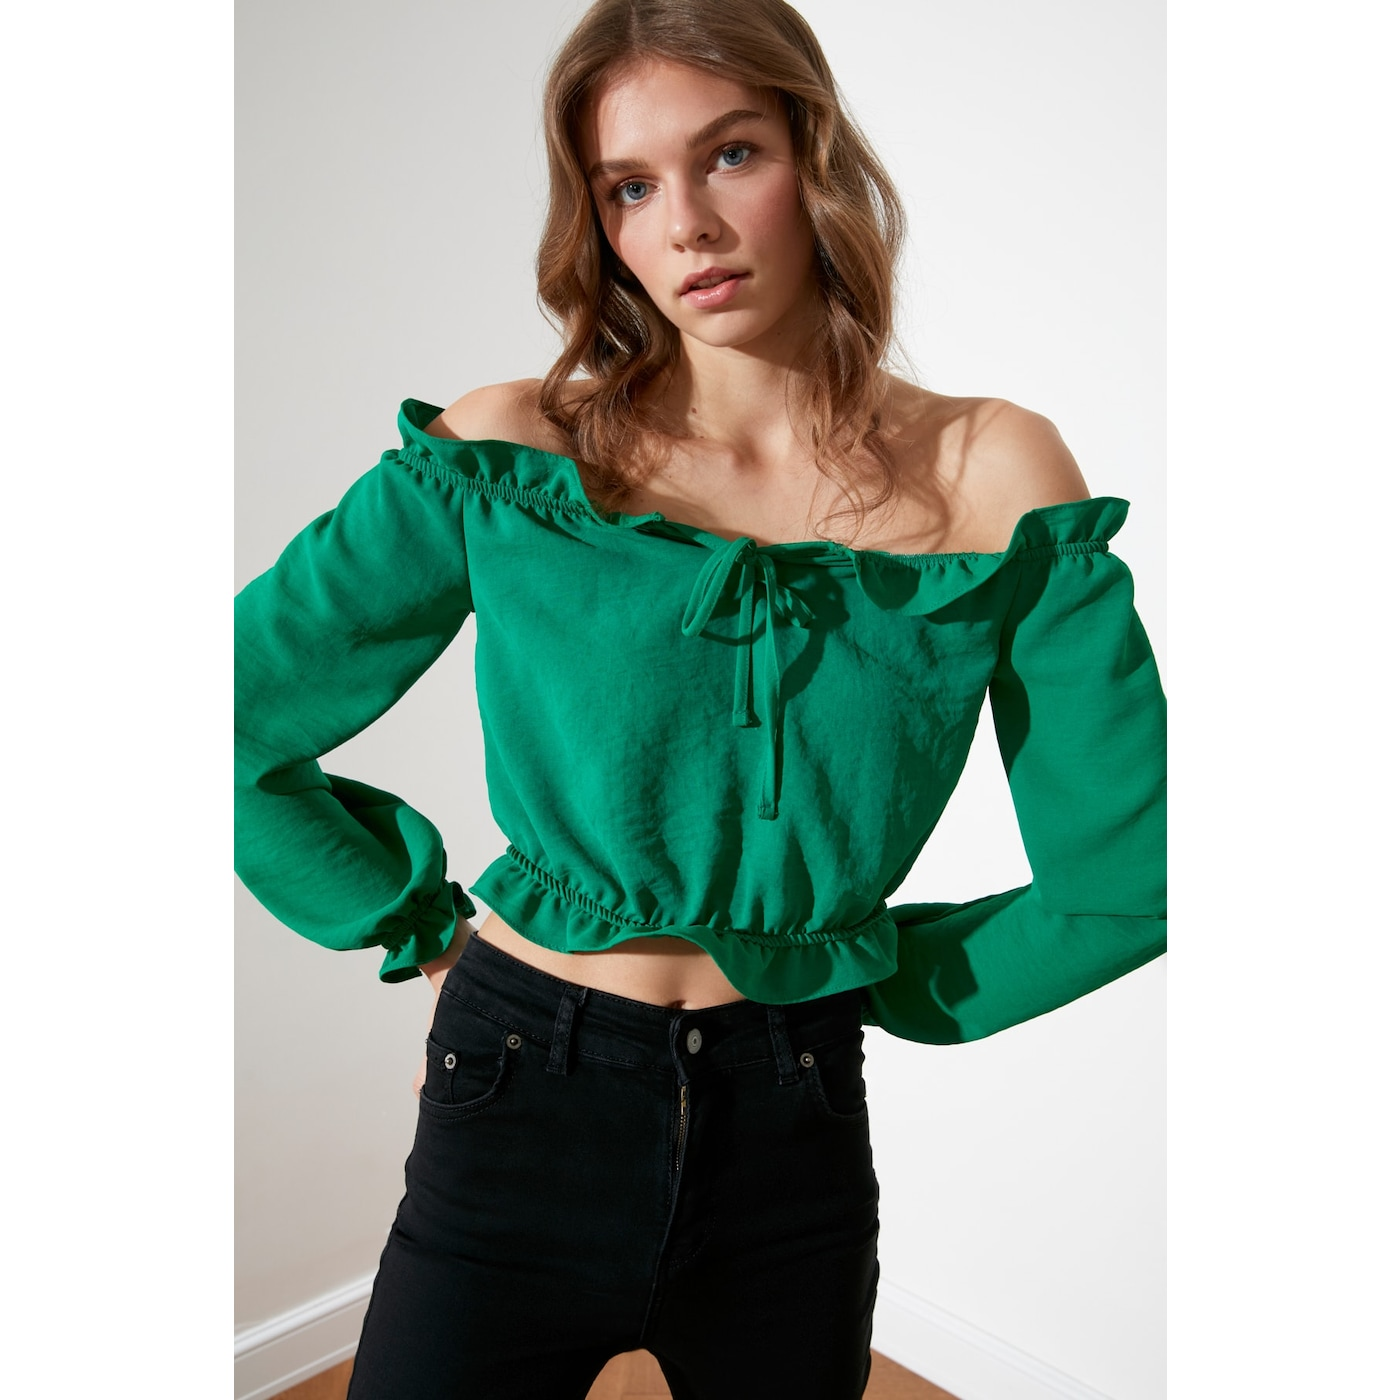 Trendyol Green Binding Detailed Blouse dámské 38